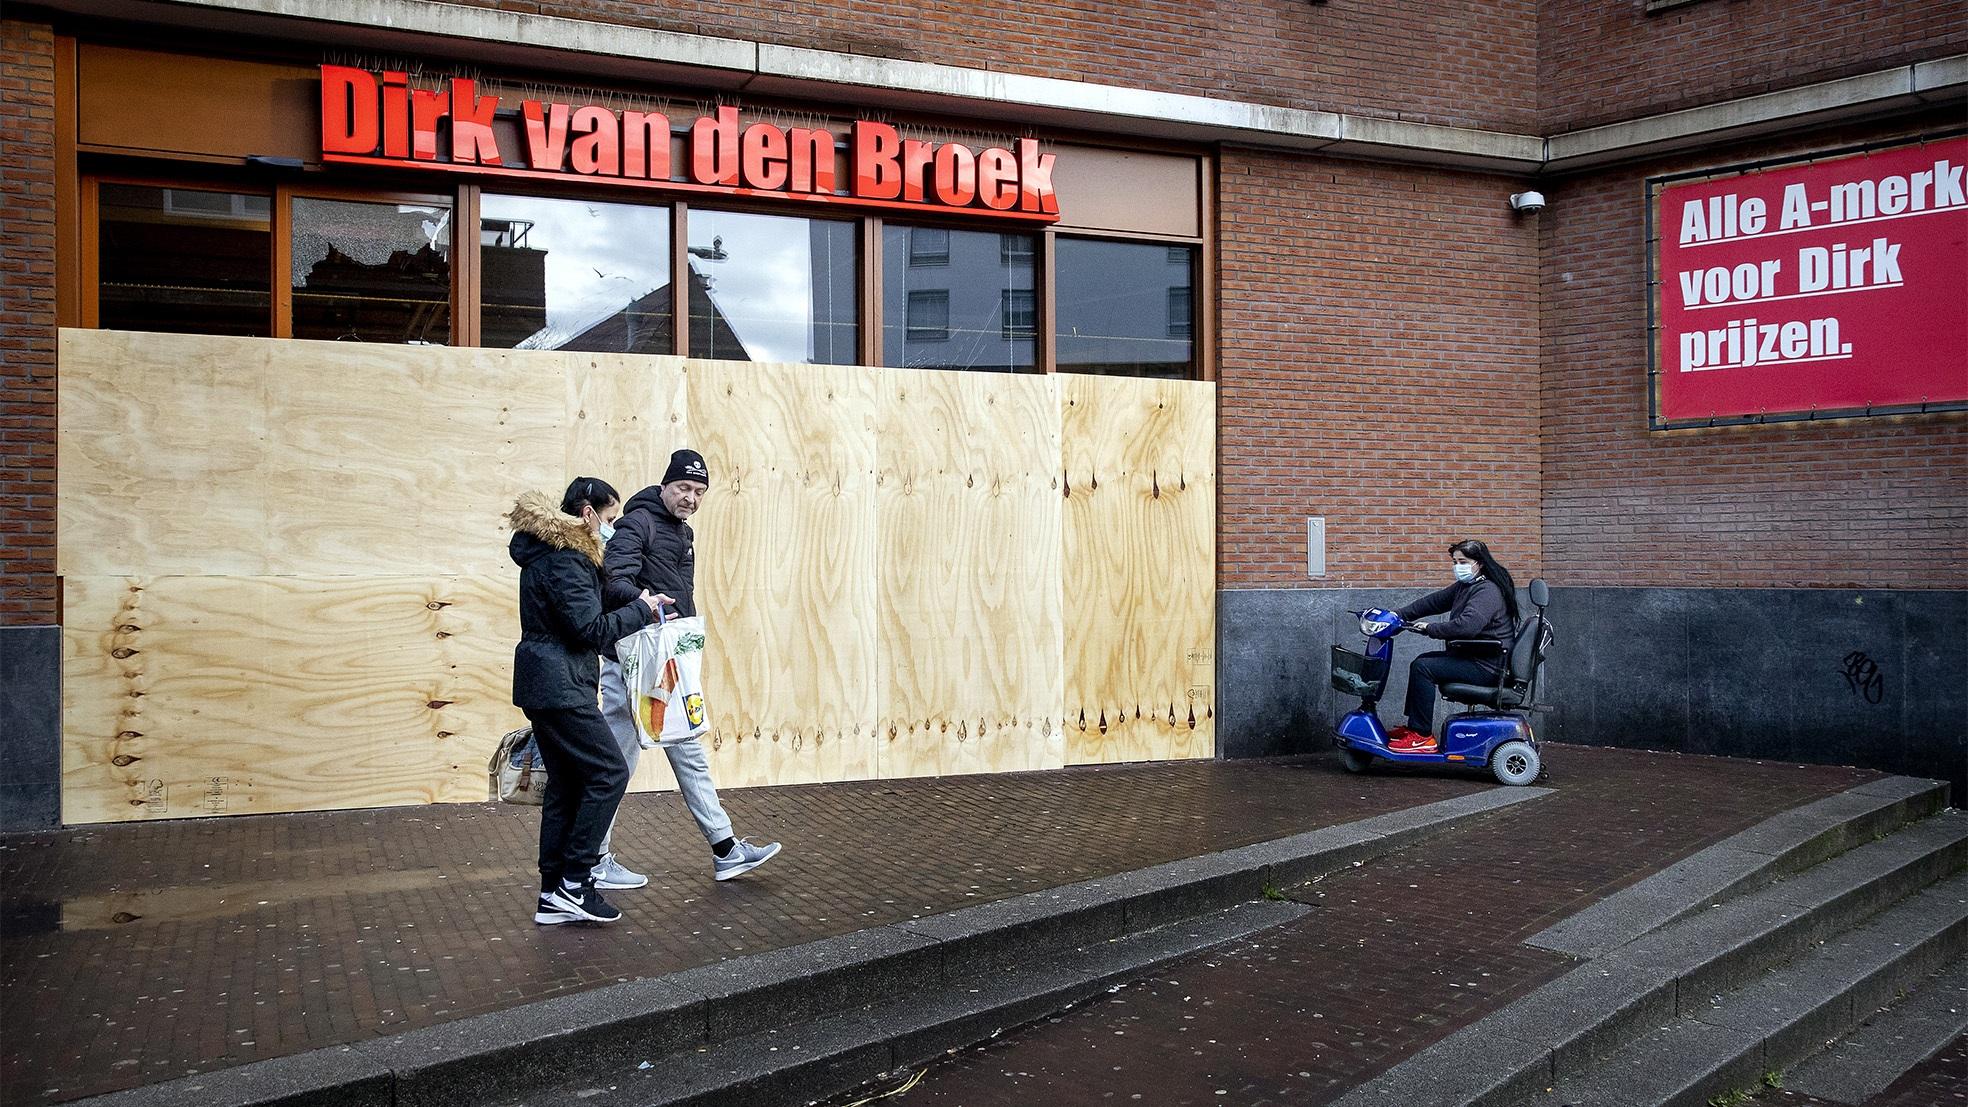 Dirk supermarkt rotterdam rellen avondklok dag